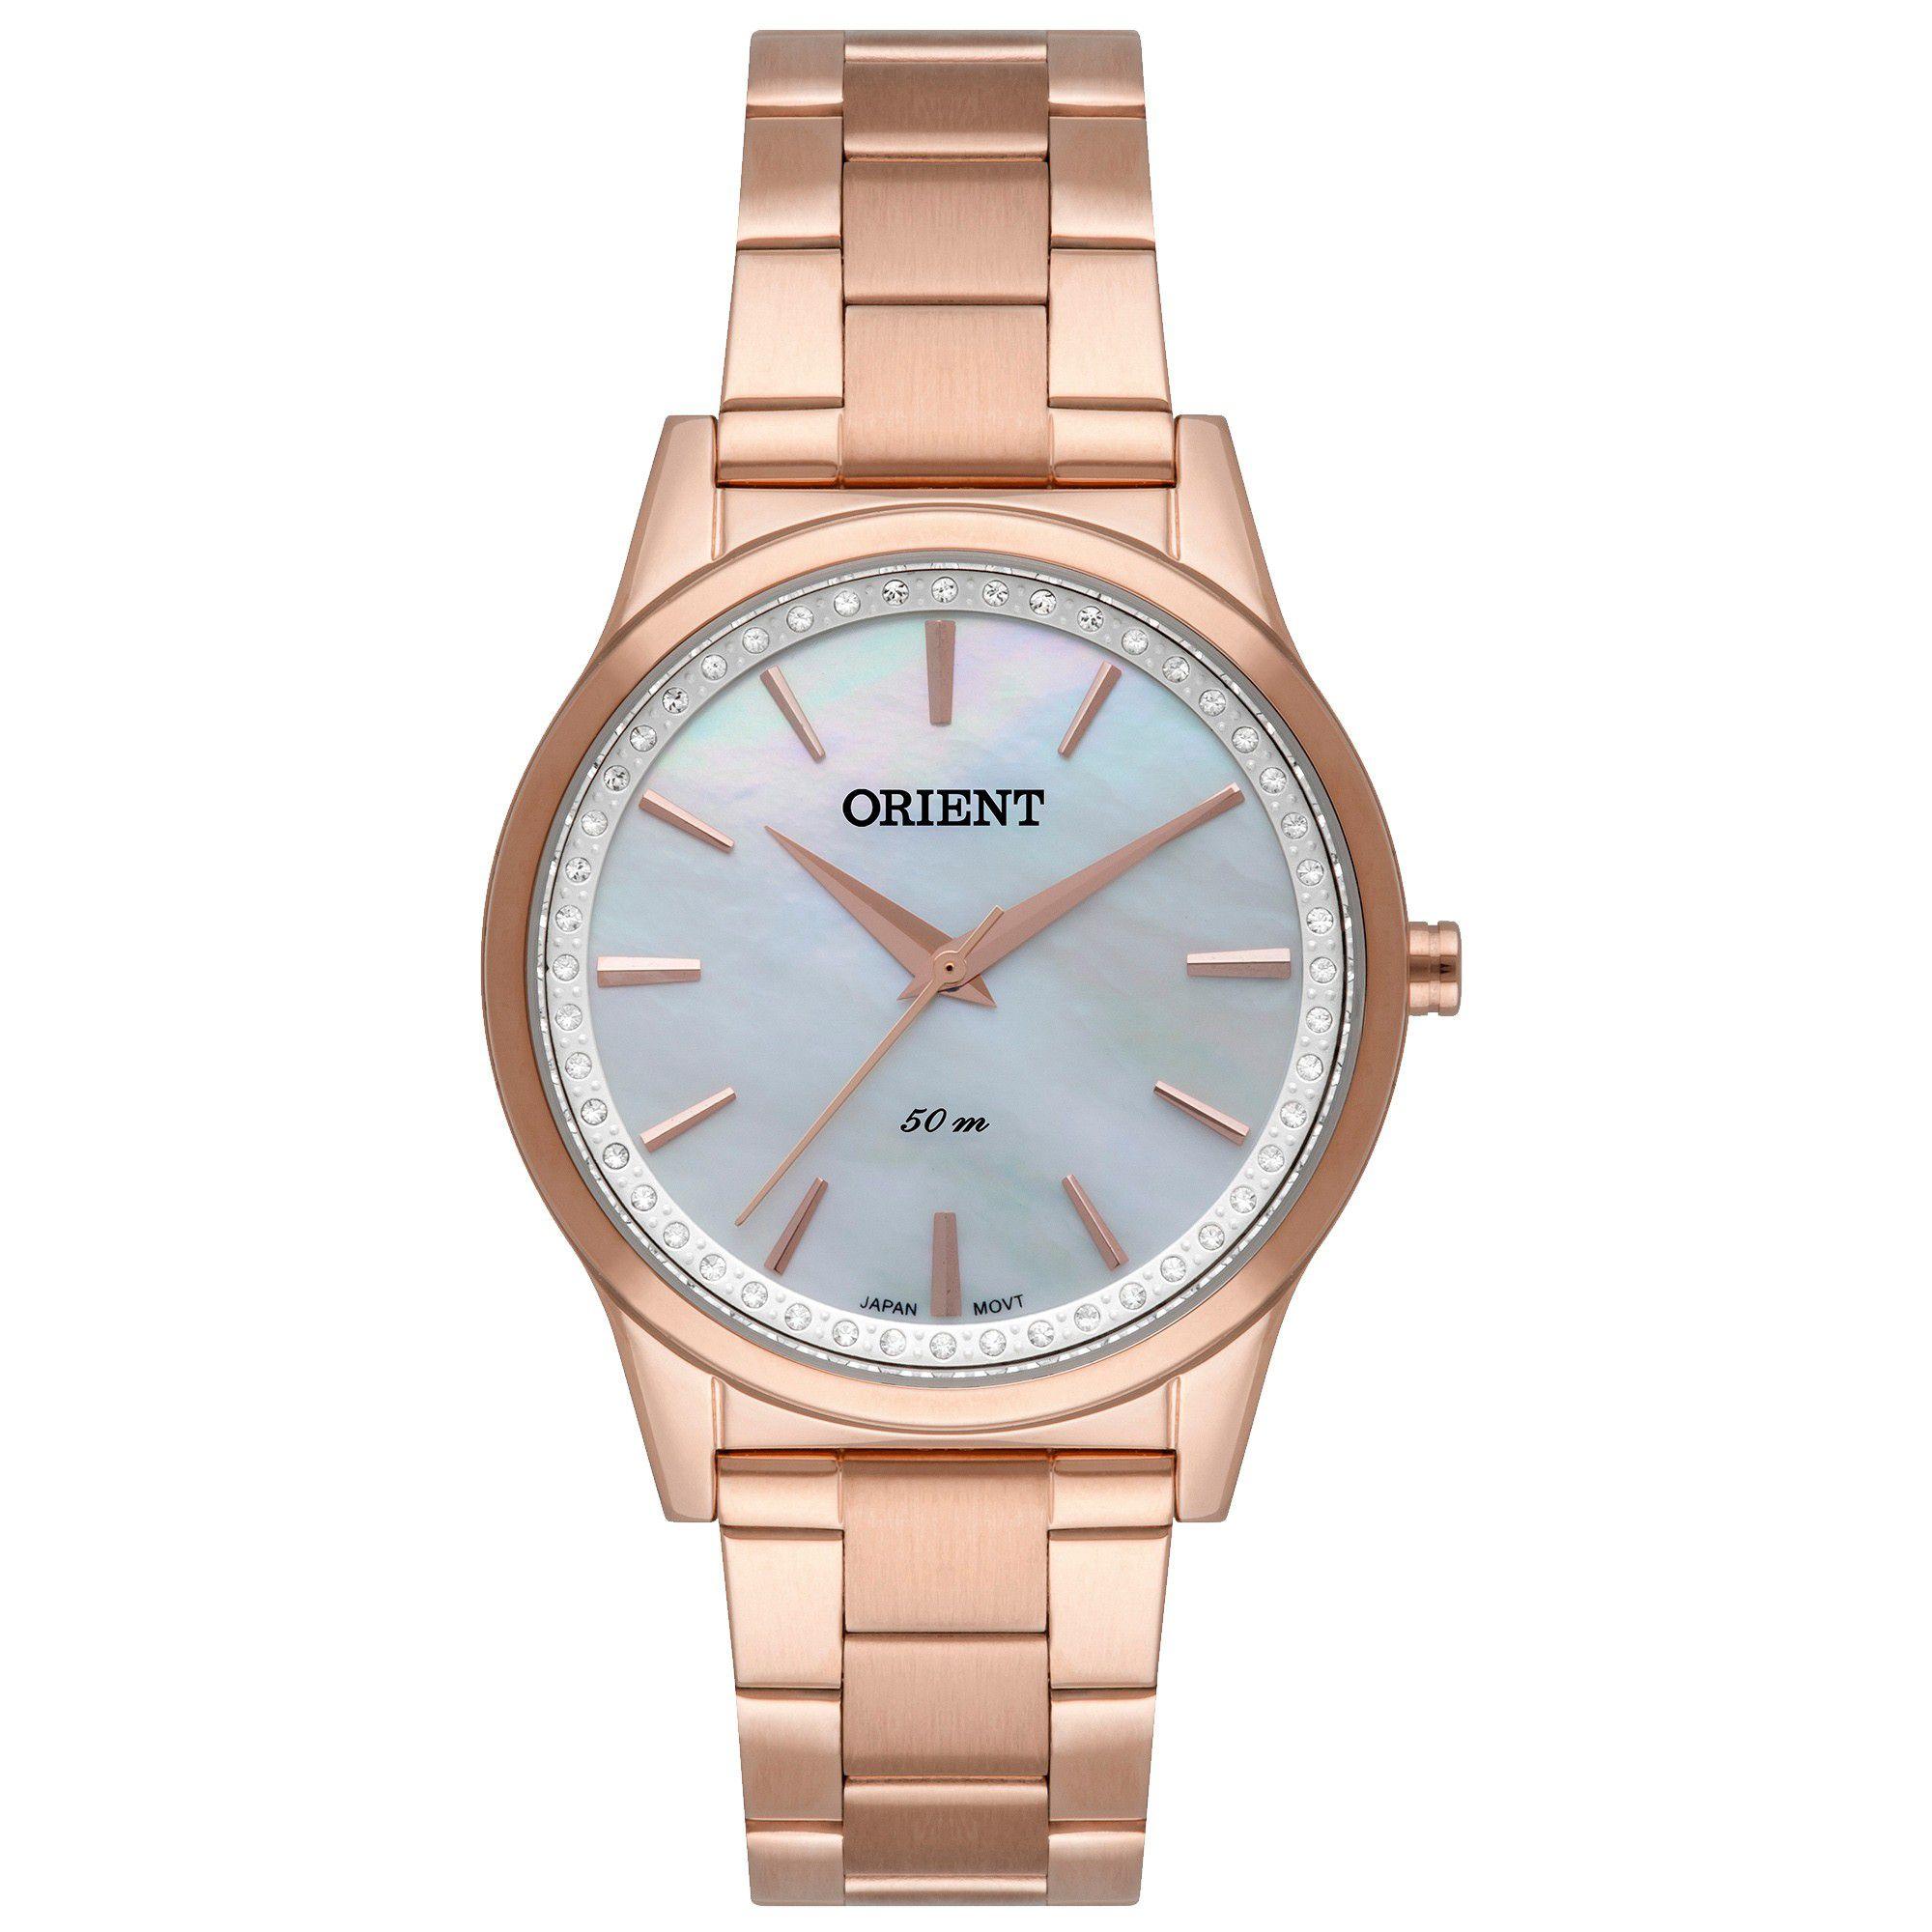 Relógio Feminino Orient FRSS0041 B1RX